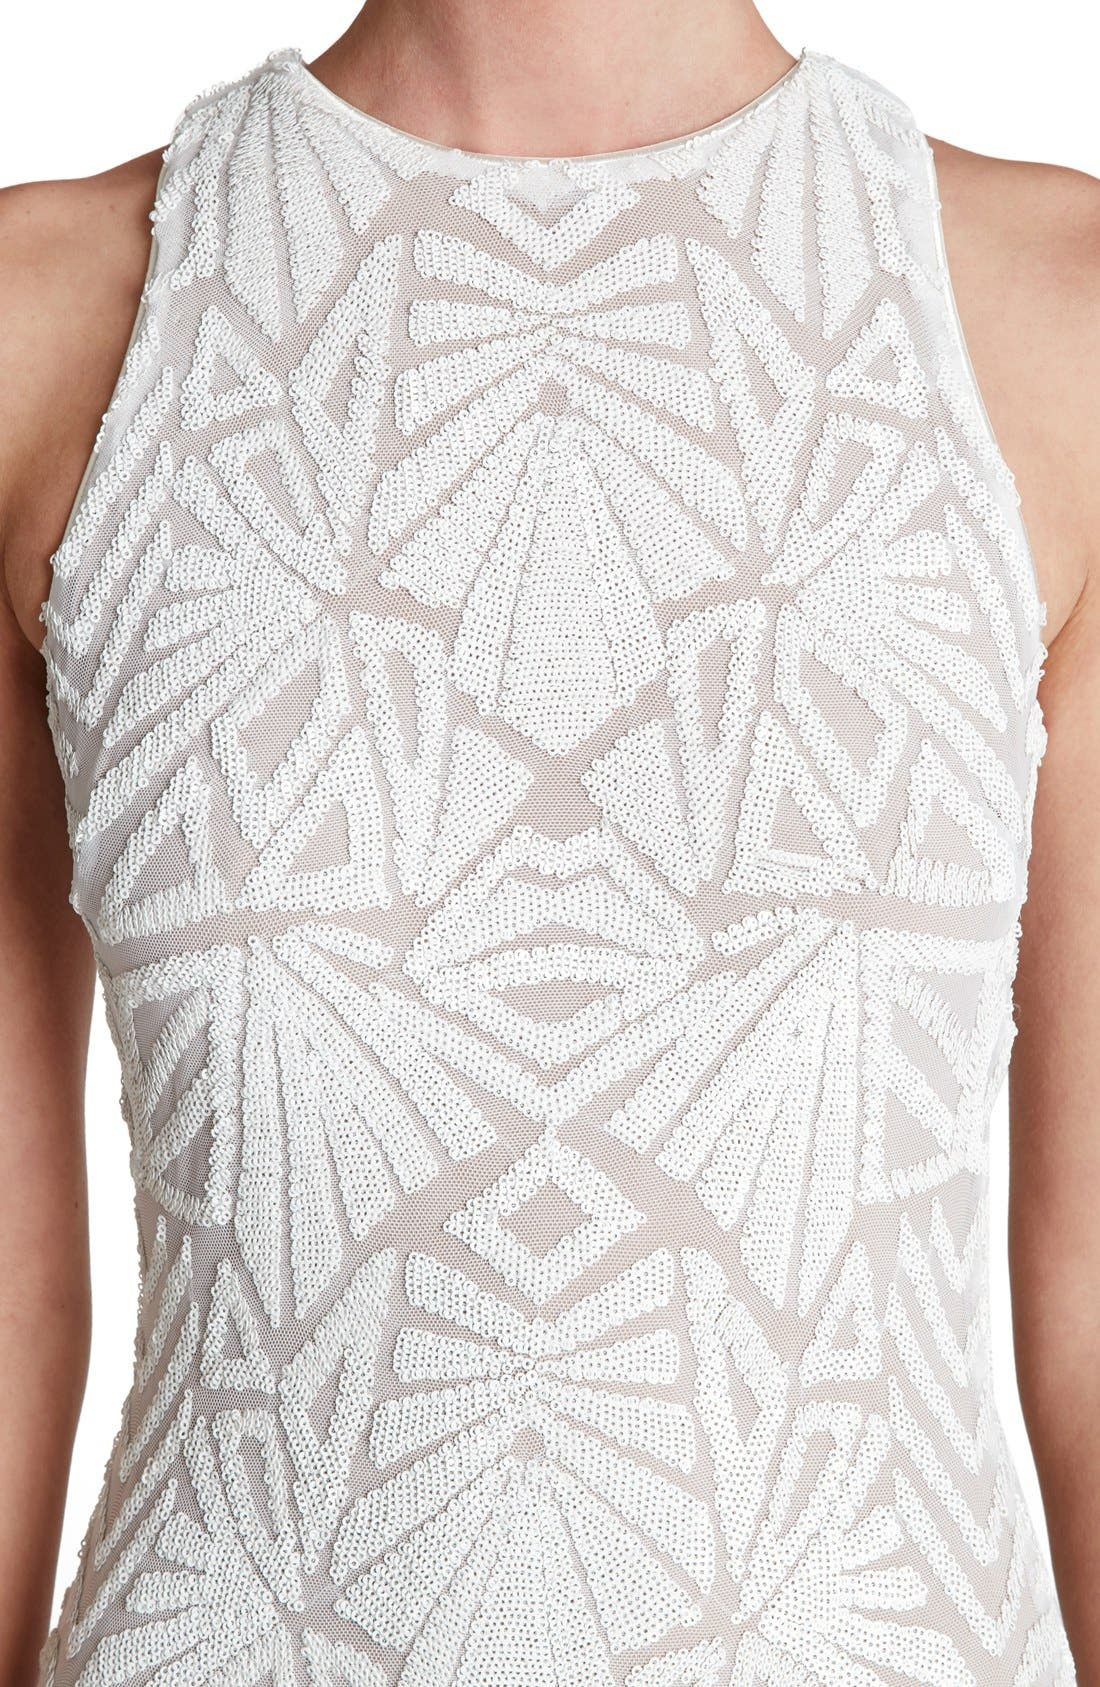 Alternate Image 4  - Dress the Population 'Mia' Sequin Sleeveless Skater Dress